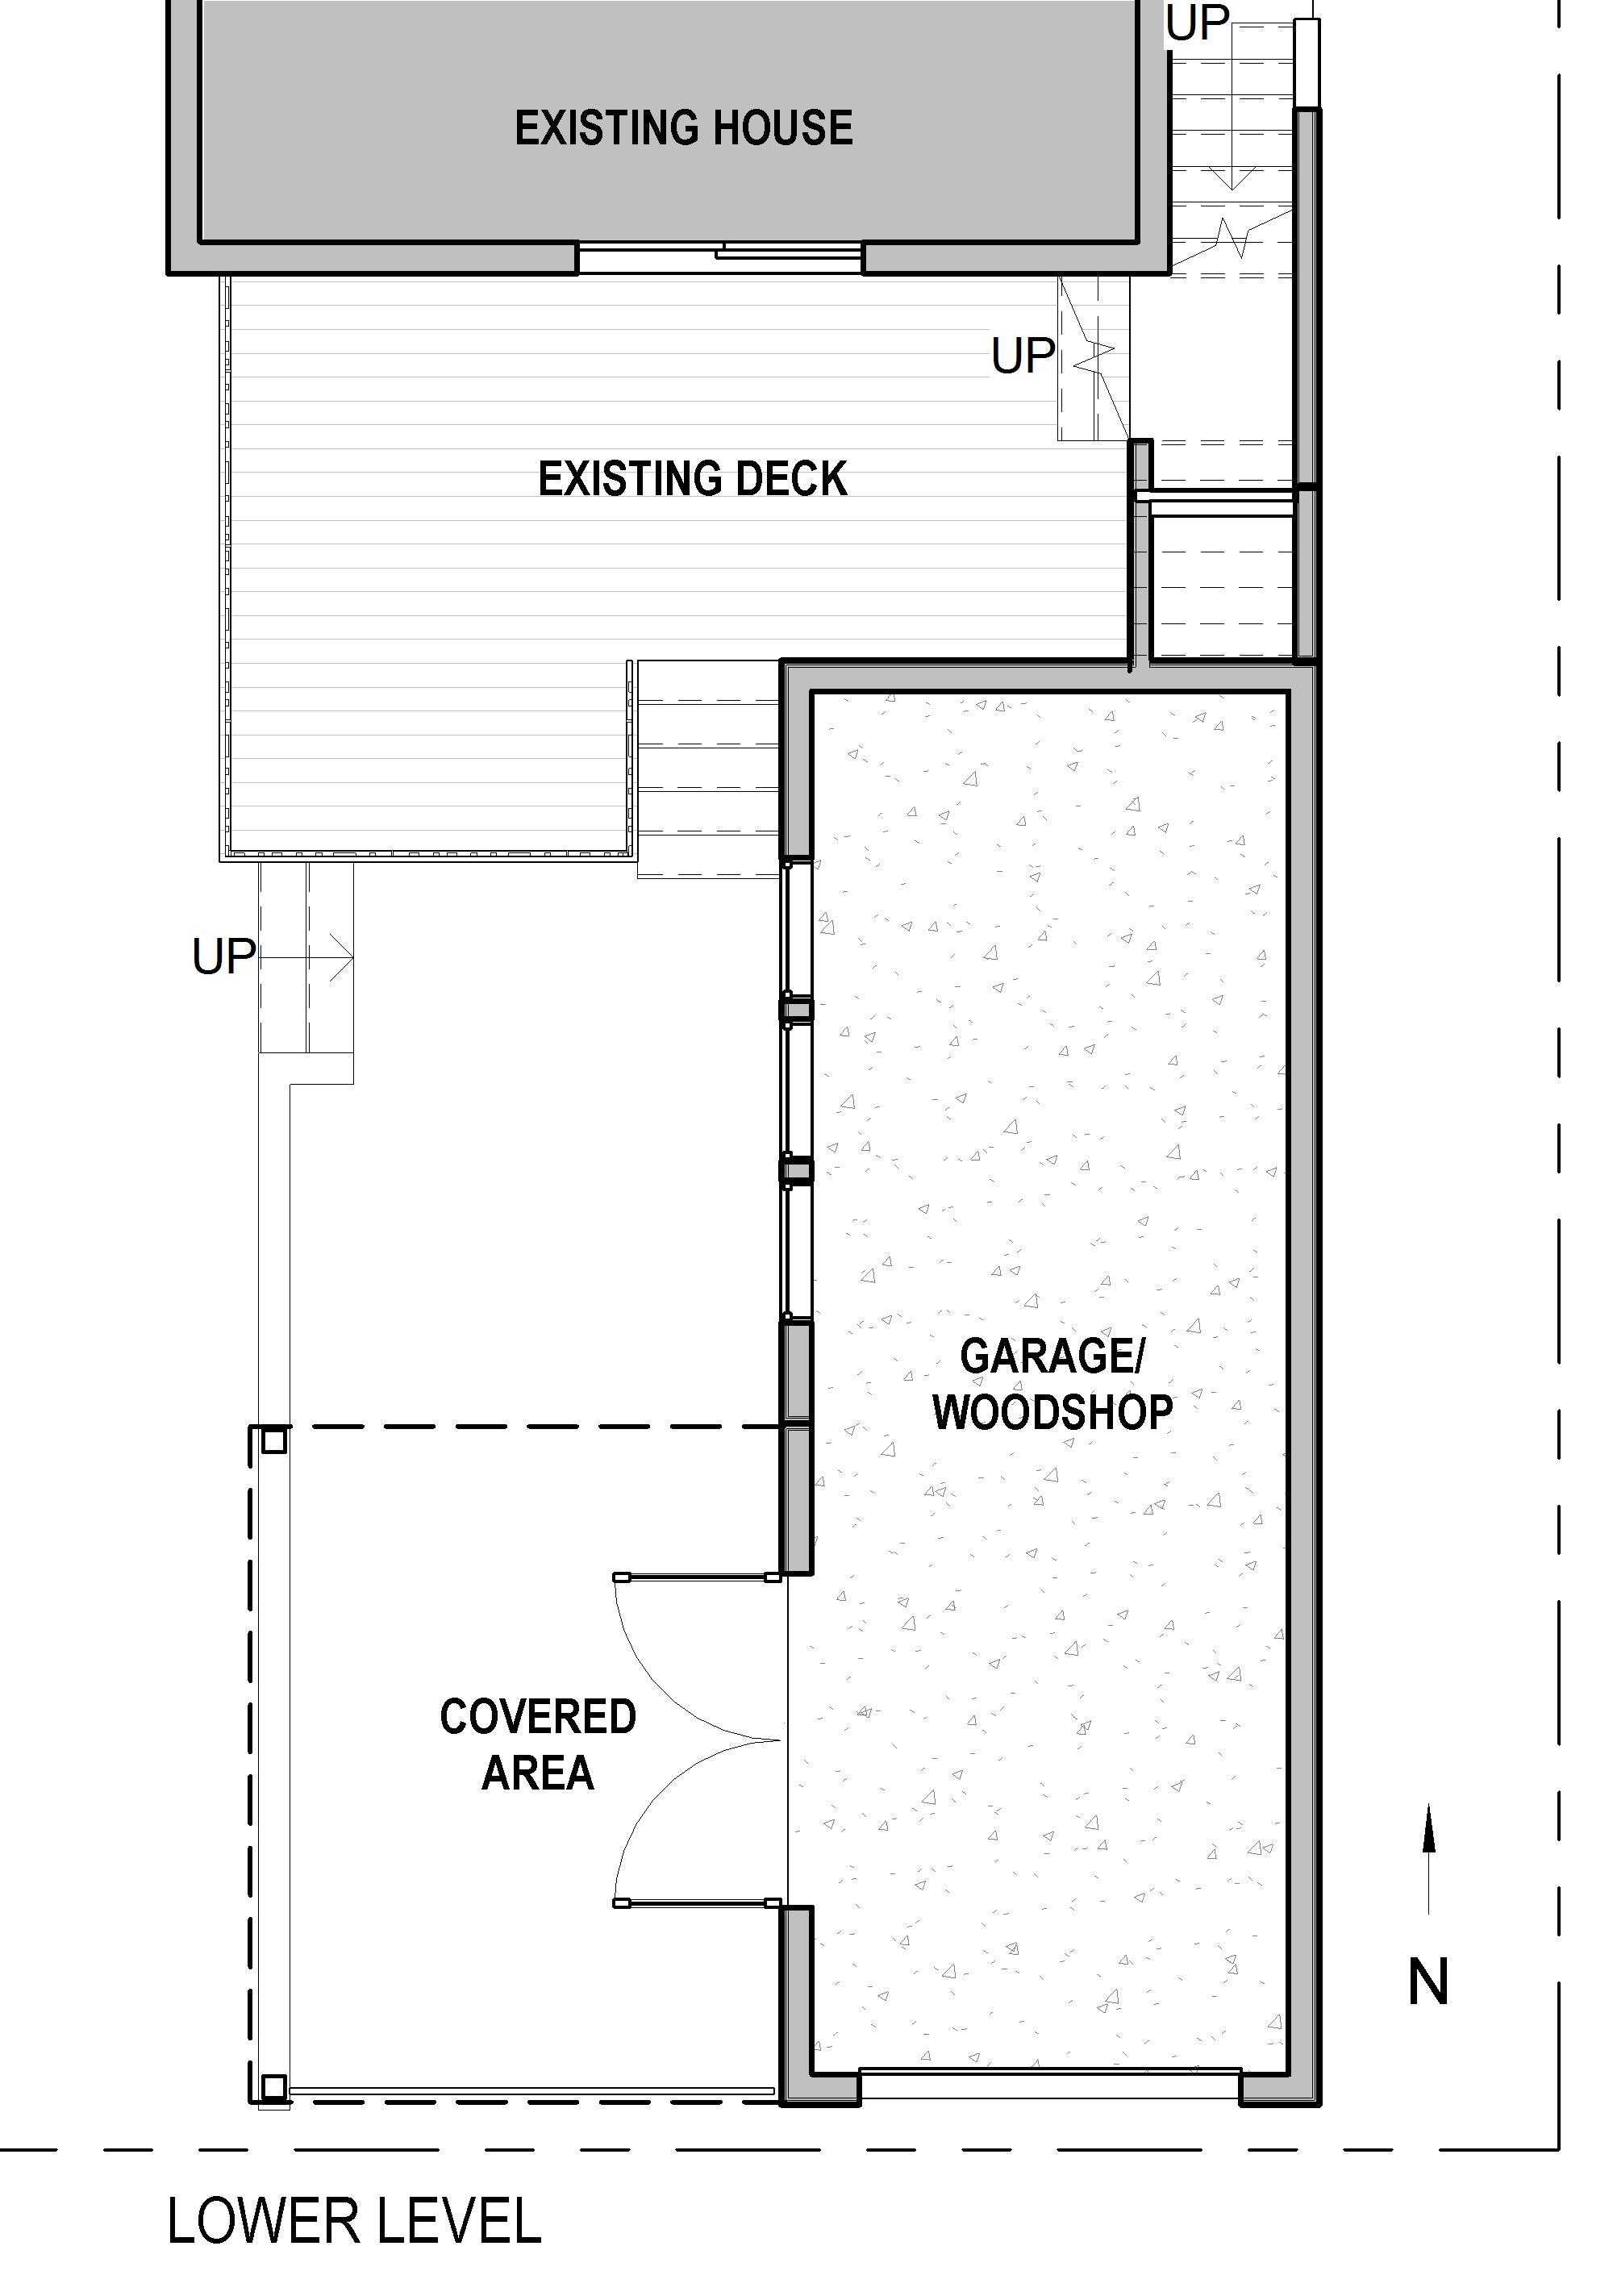 Gladstone studio and workshop - portland, or - level 1